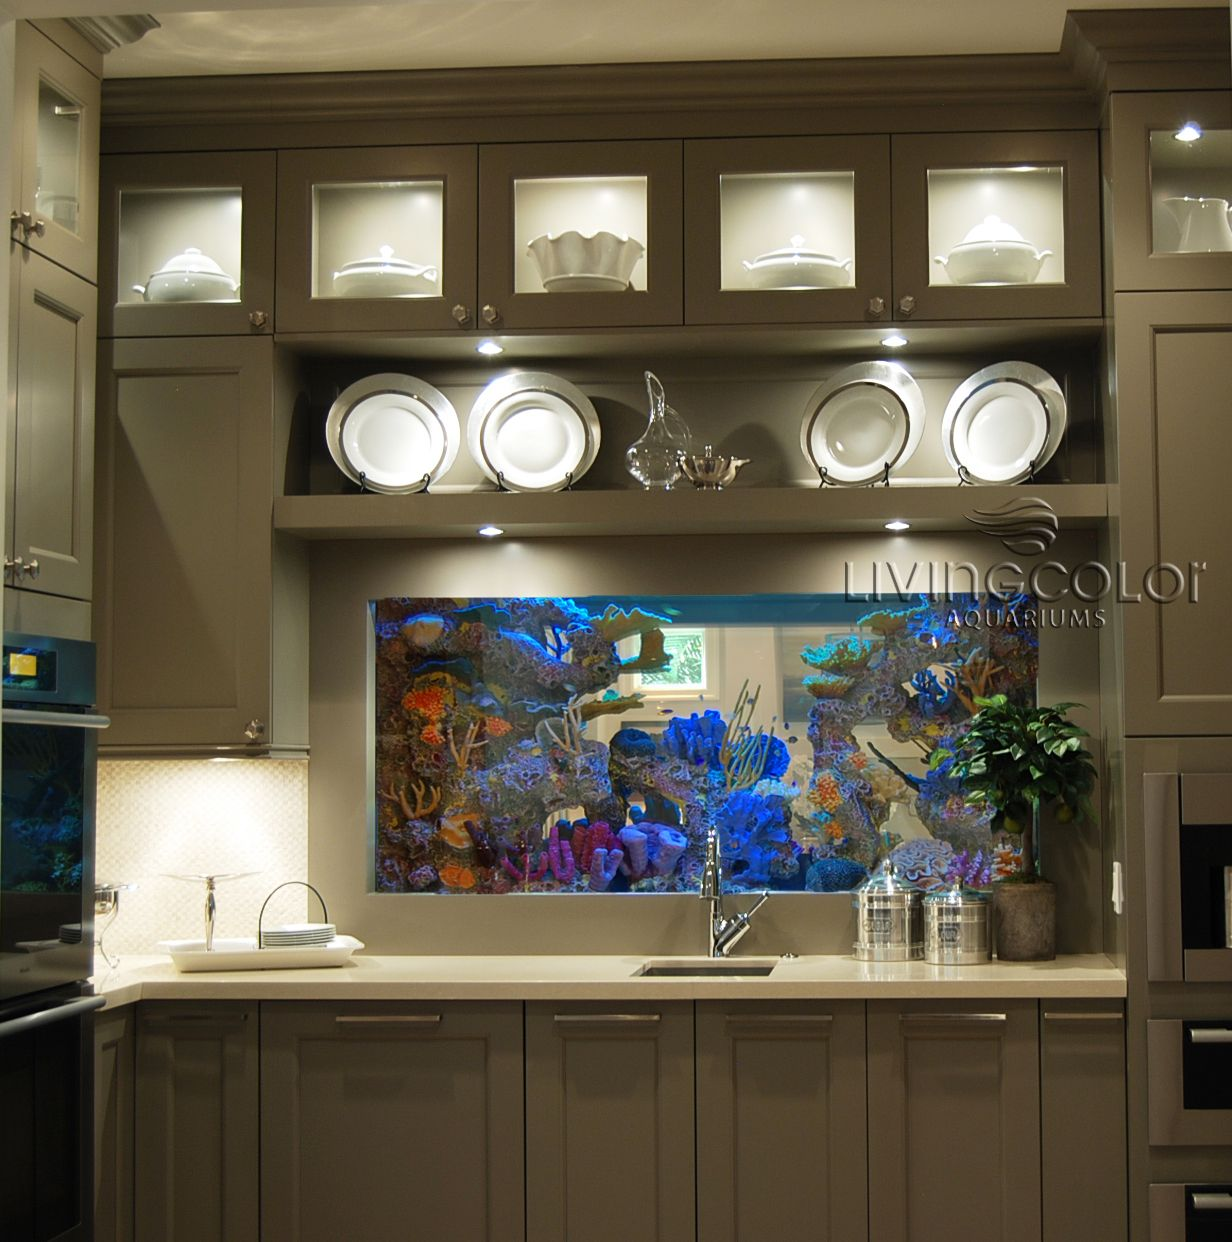 Fish aquarium dimensions - Double View Custom Aquarium Dimensions 60 X 24 X 42 H 350